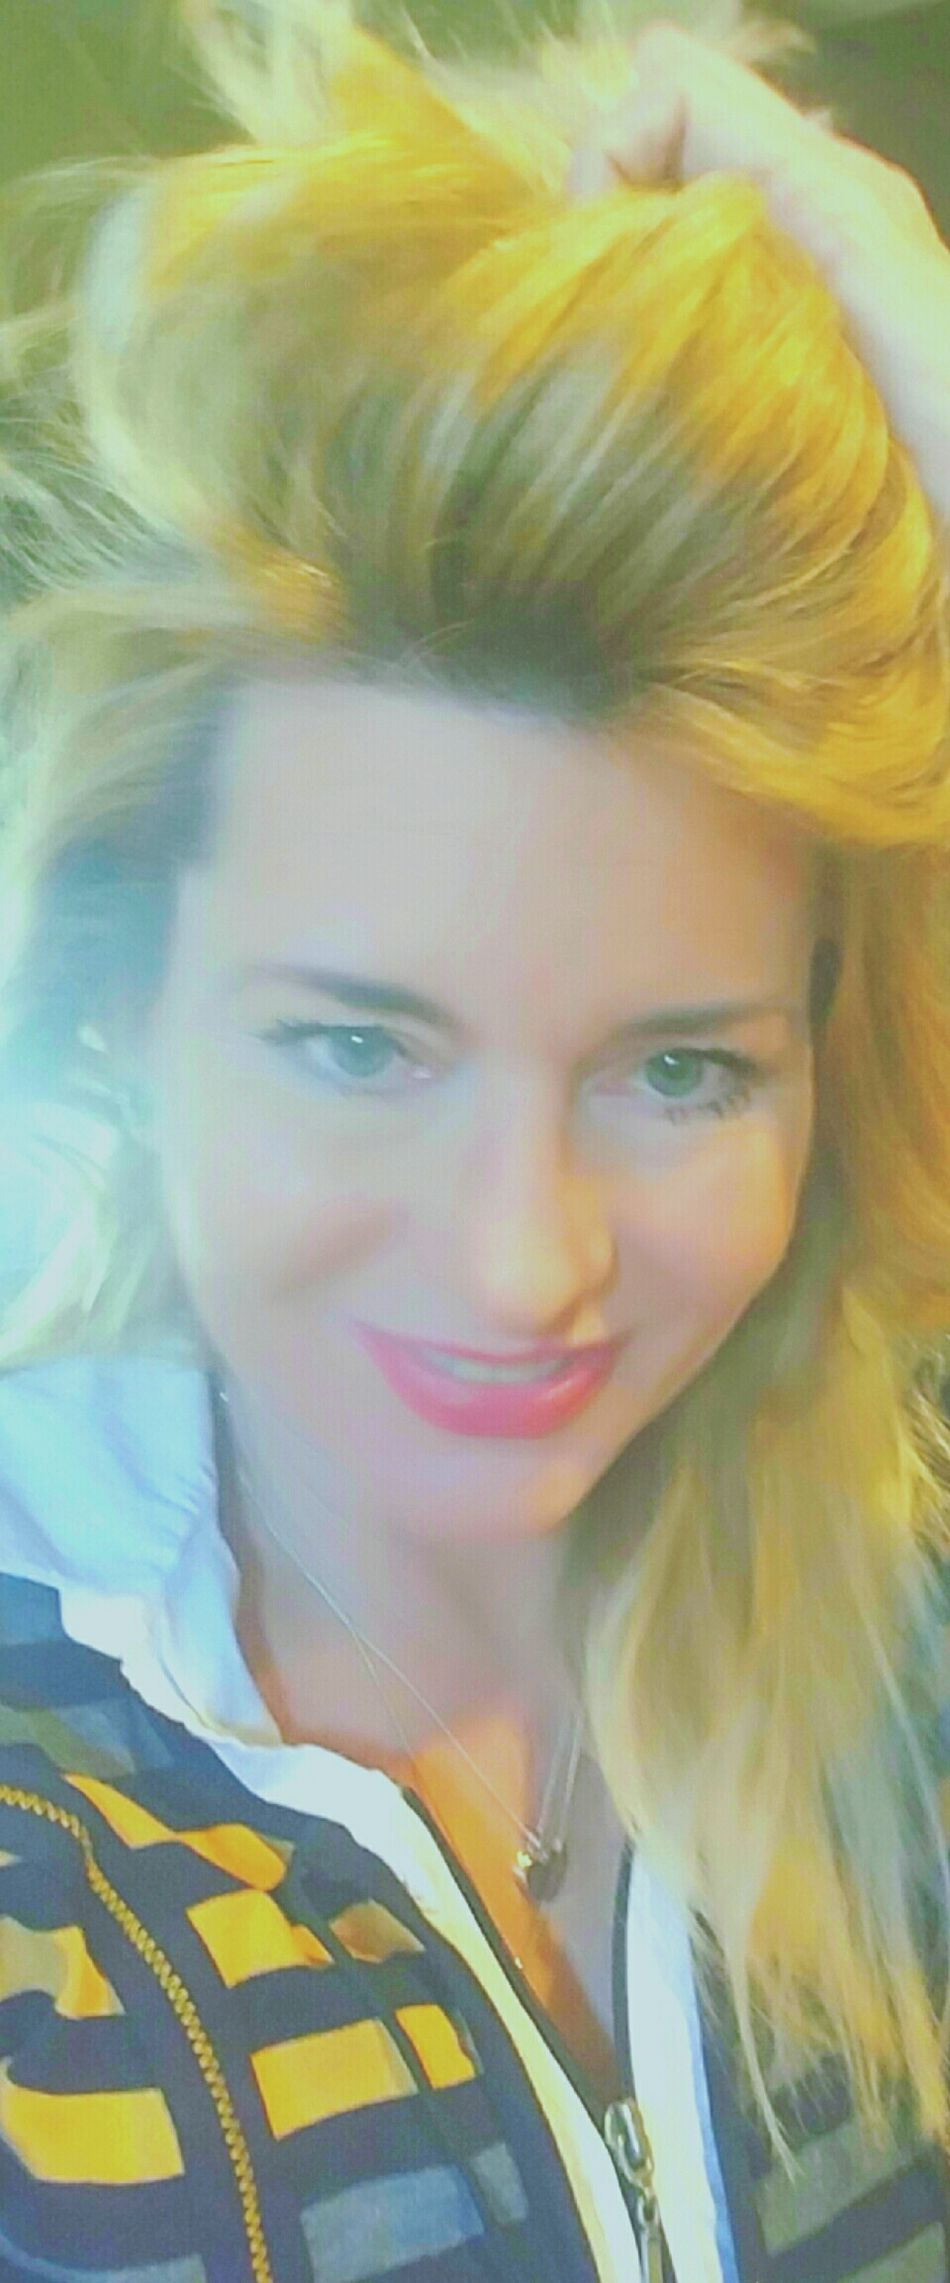 Women Of EyeEm Fixingmyhair Funny Stuff Fashion Headin Out Blessedandthankful Friday Evening Casinonight Funfunfun Keep Calm And Always Smile Life Is A Beach Girlsbeinggirls Share Your AdventureLove Life MyEyeEm Greatfriends  Gratefull Peaceandlove Always Look On The Bright Side Of Life